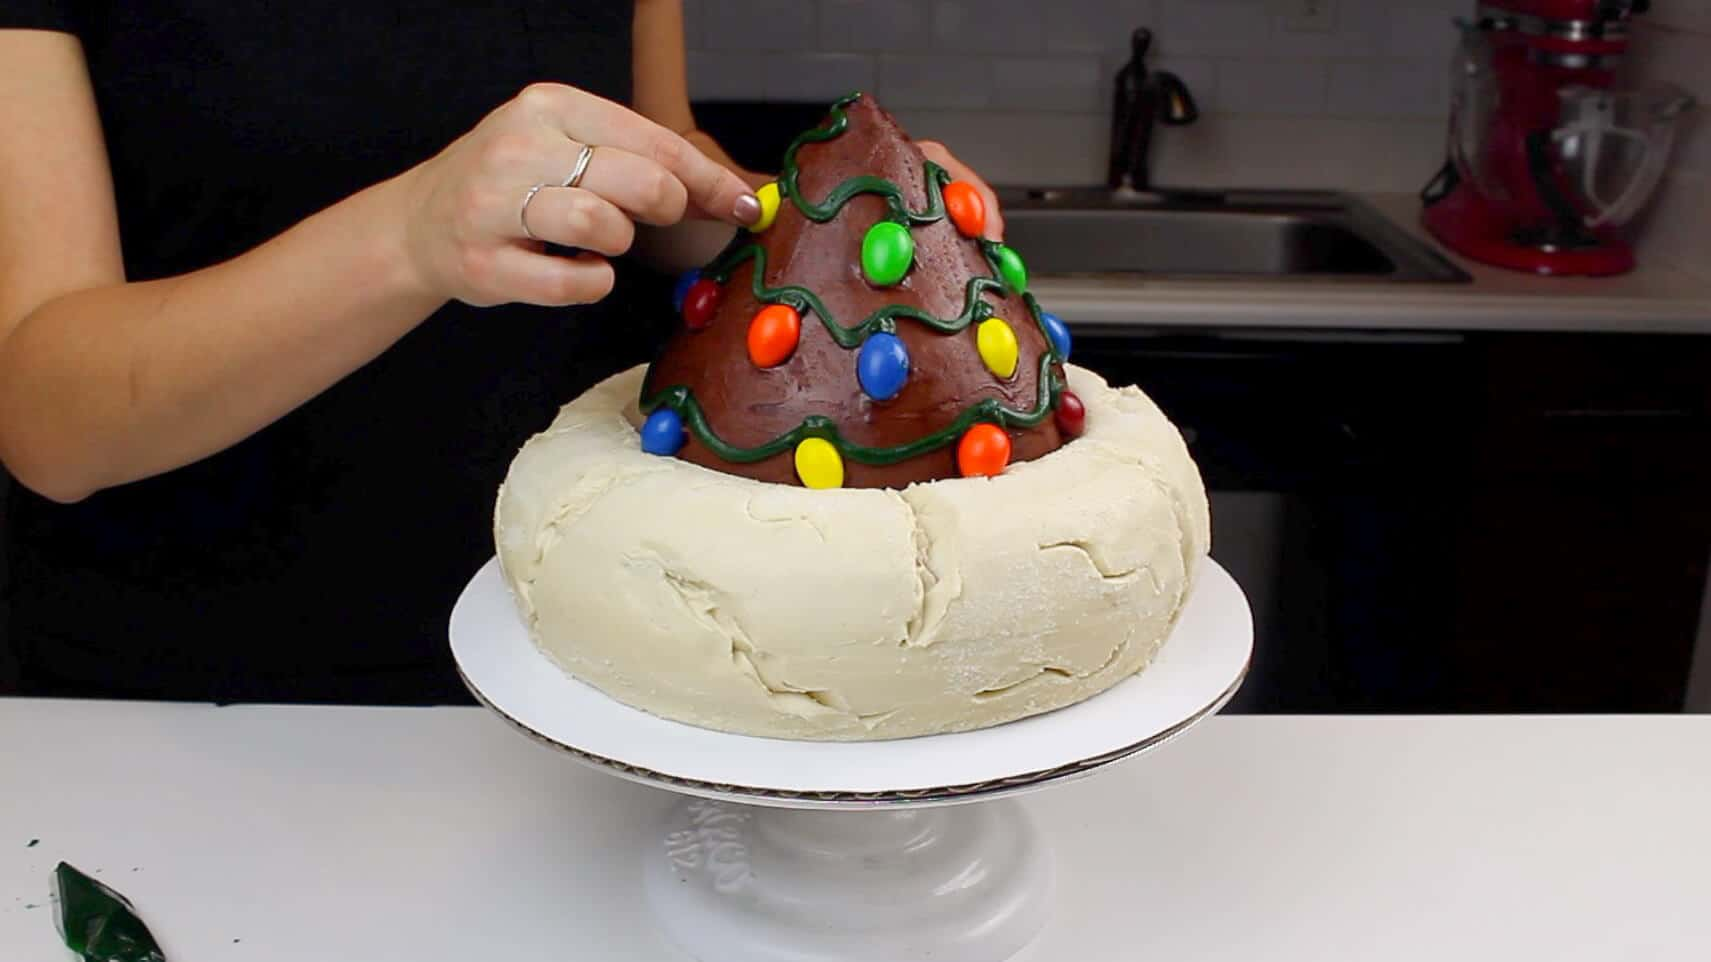 adding on lights to cake